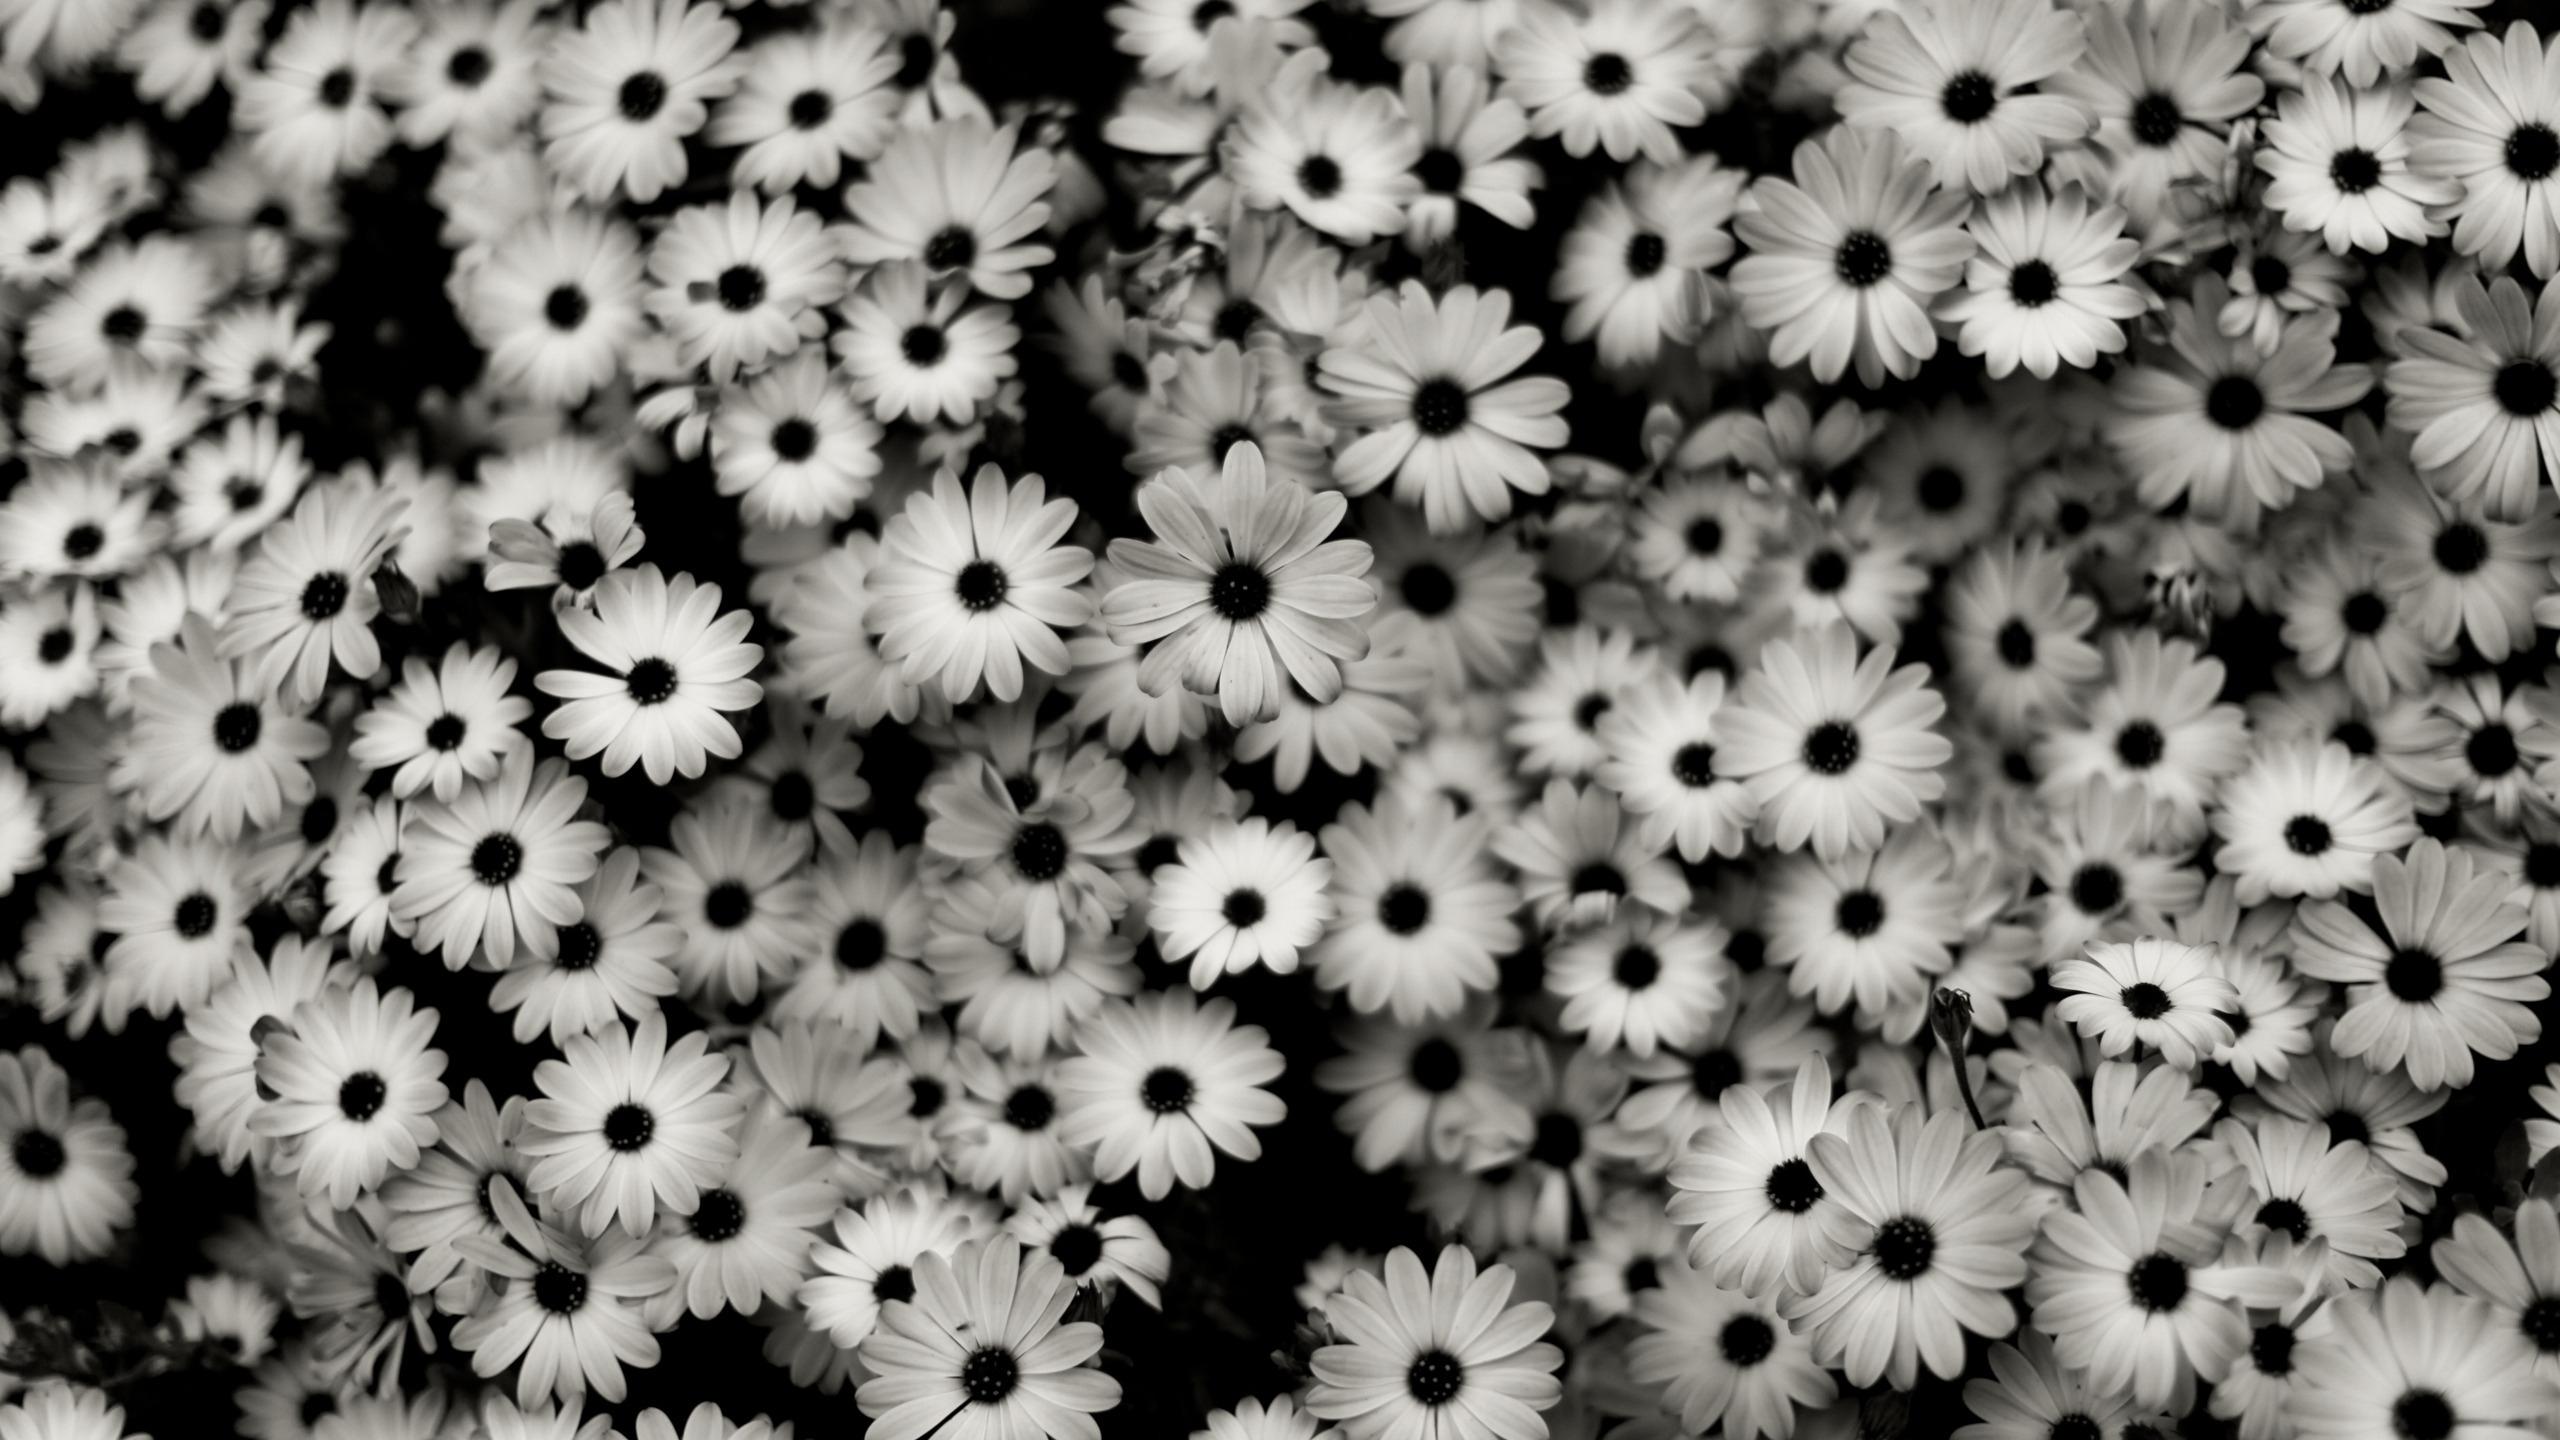 wallpaper : flowers, pattern, grey, daisies, daisy, tree, flower